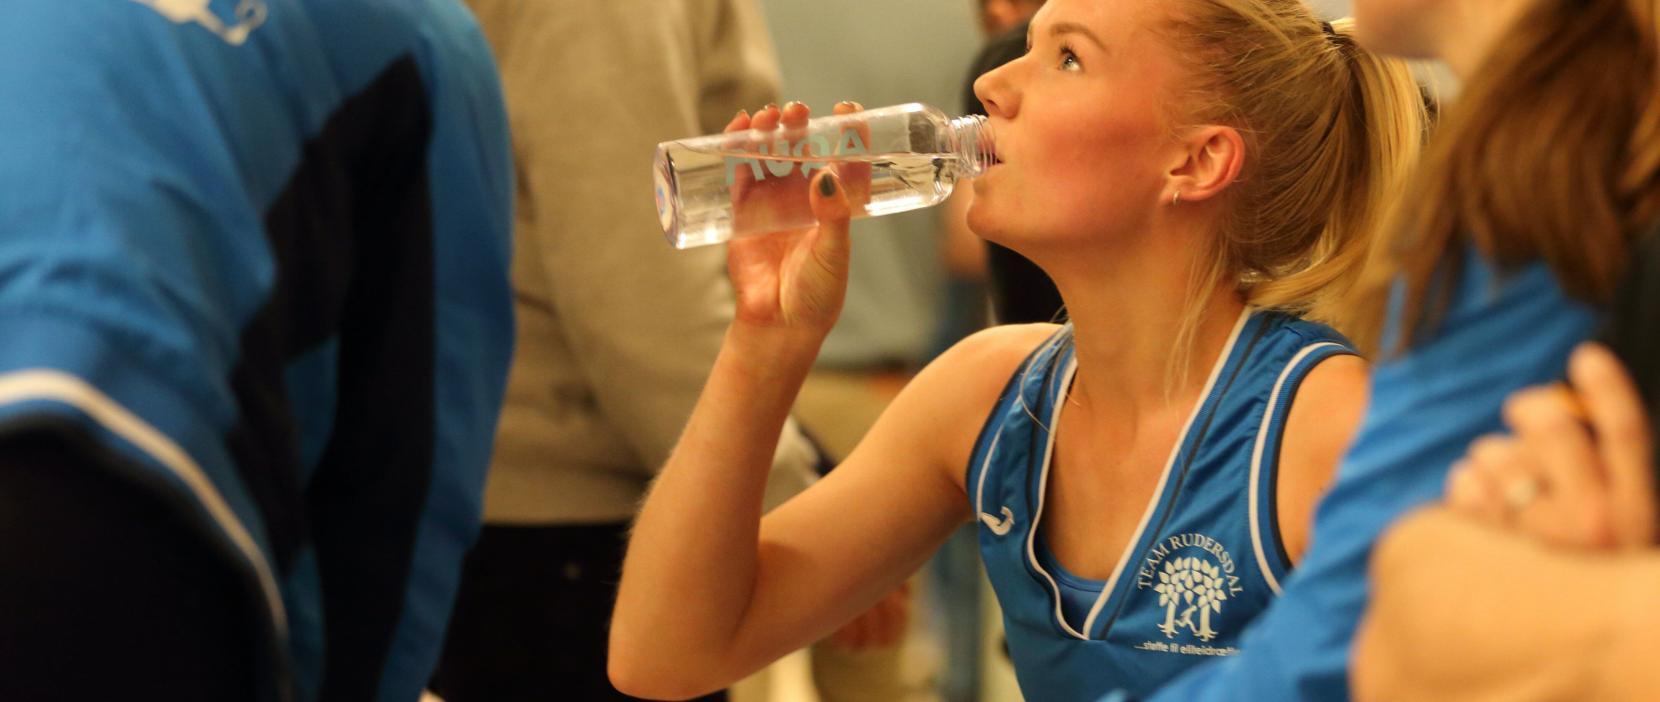 Elitesport Rudersdal - pige